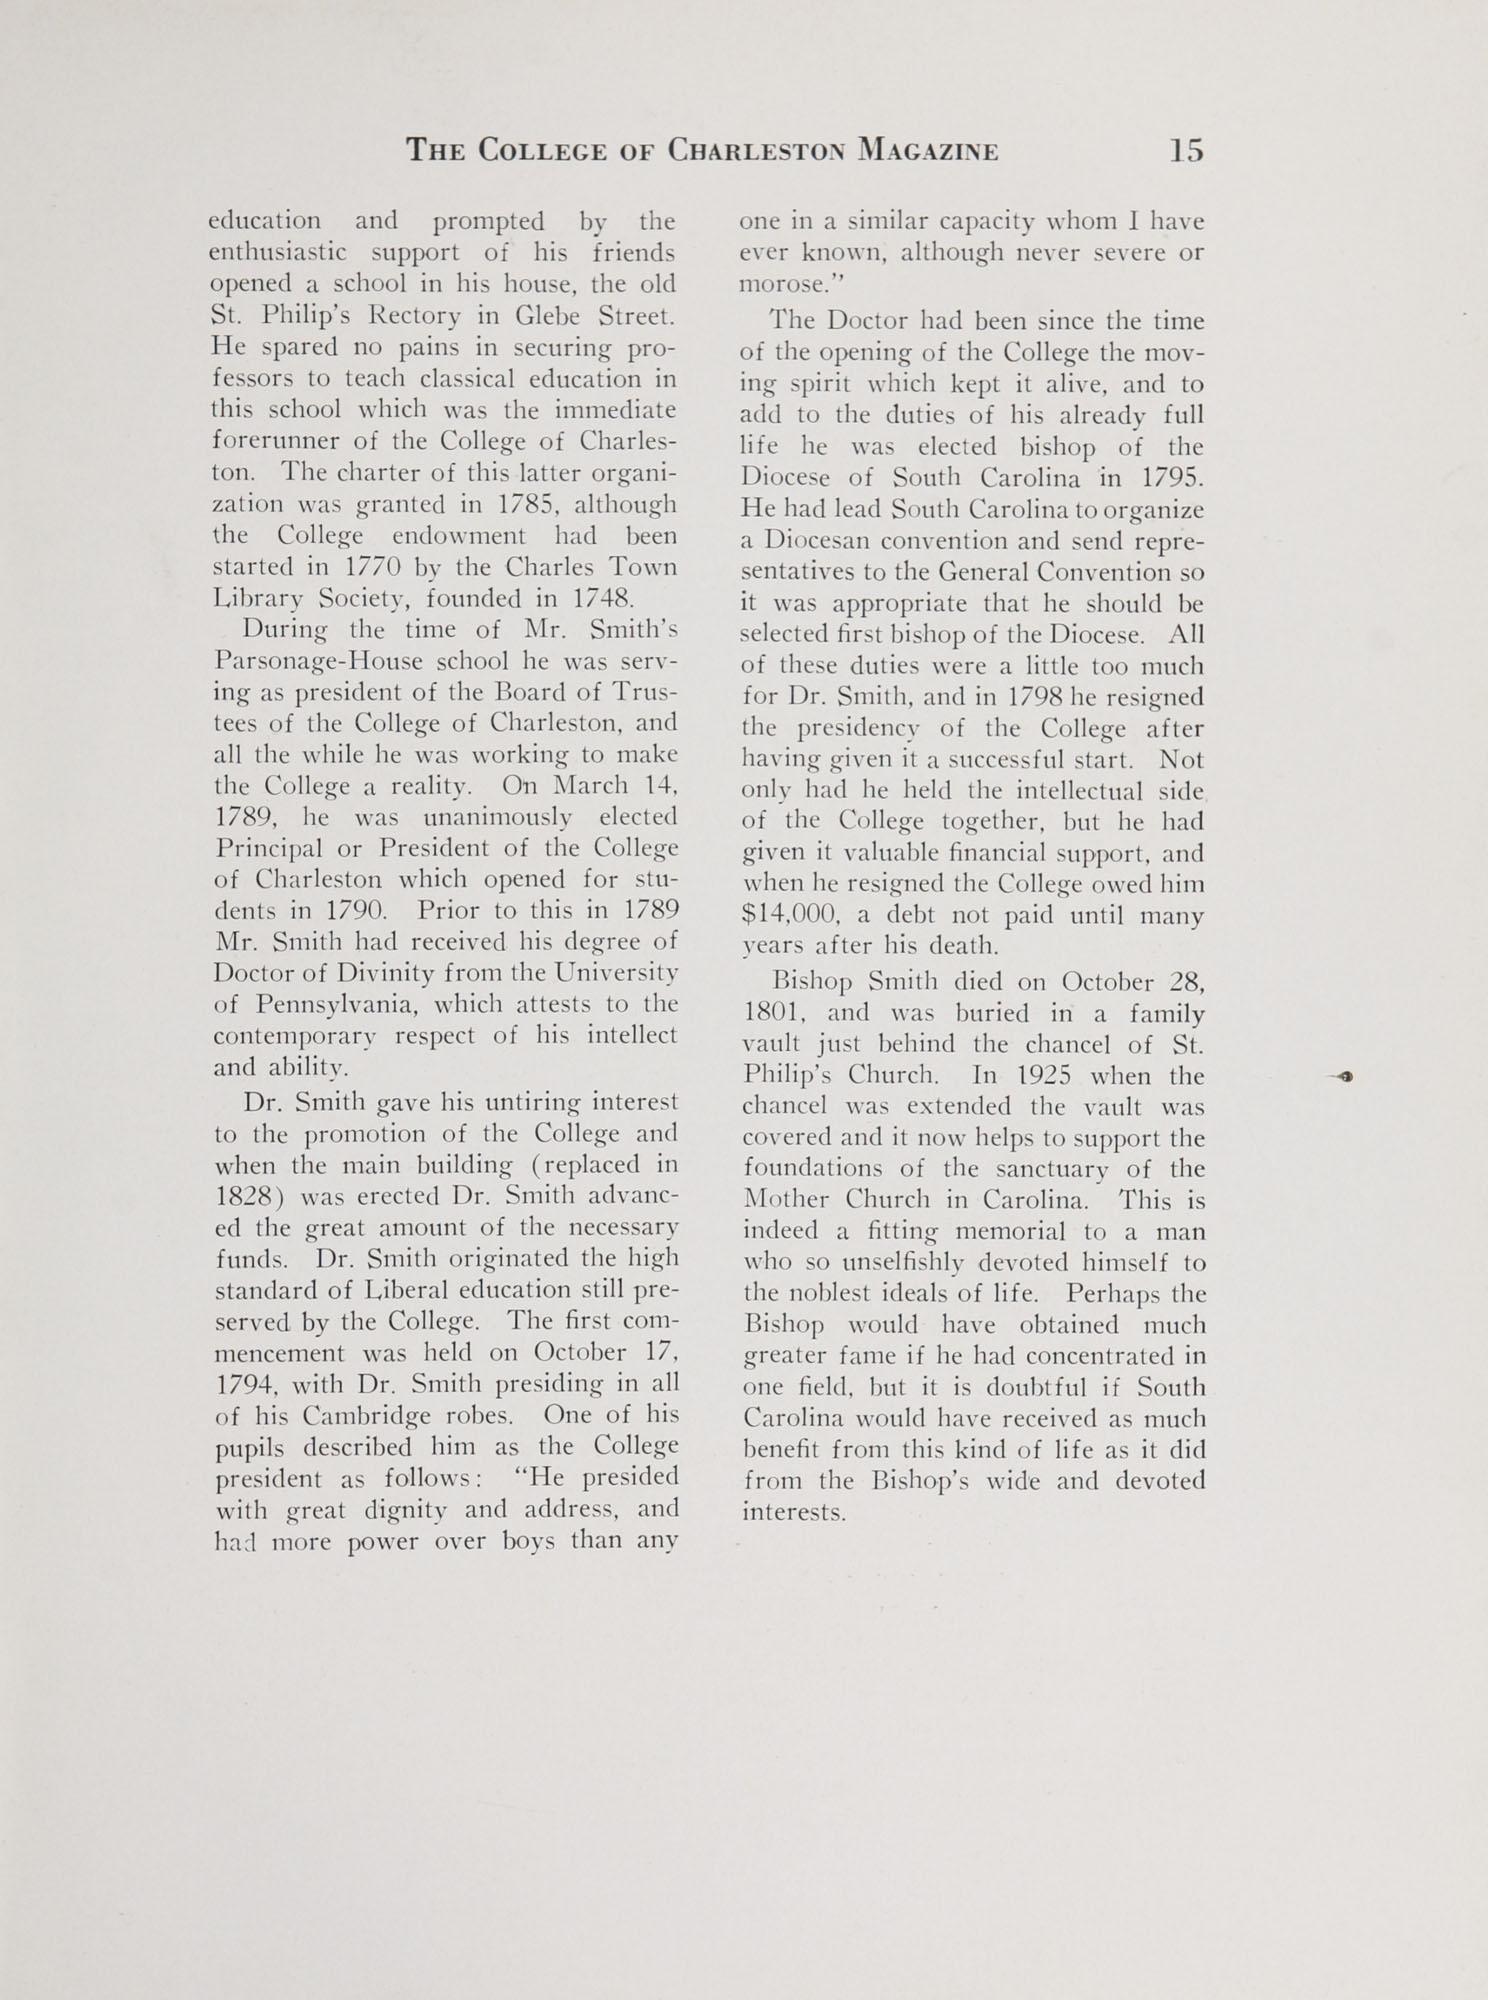 College of Charleston Magazine, 1938-1939, Vol. XXXXII No. 1, page 15